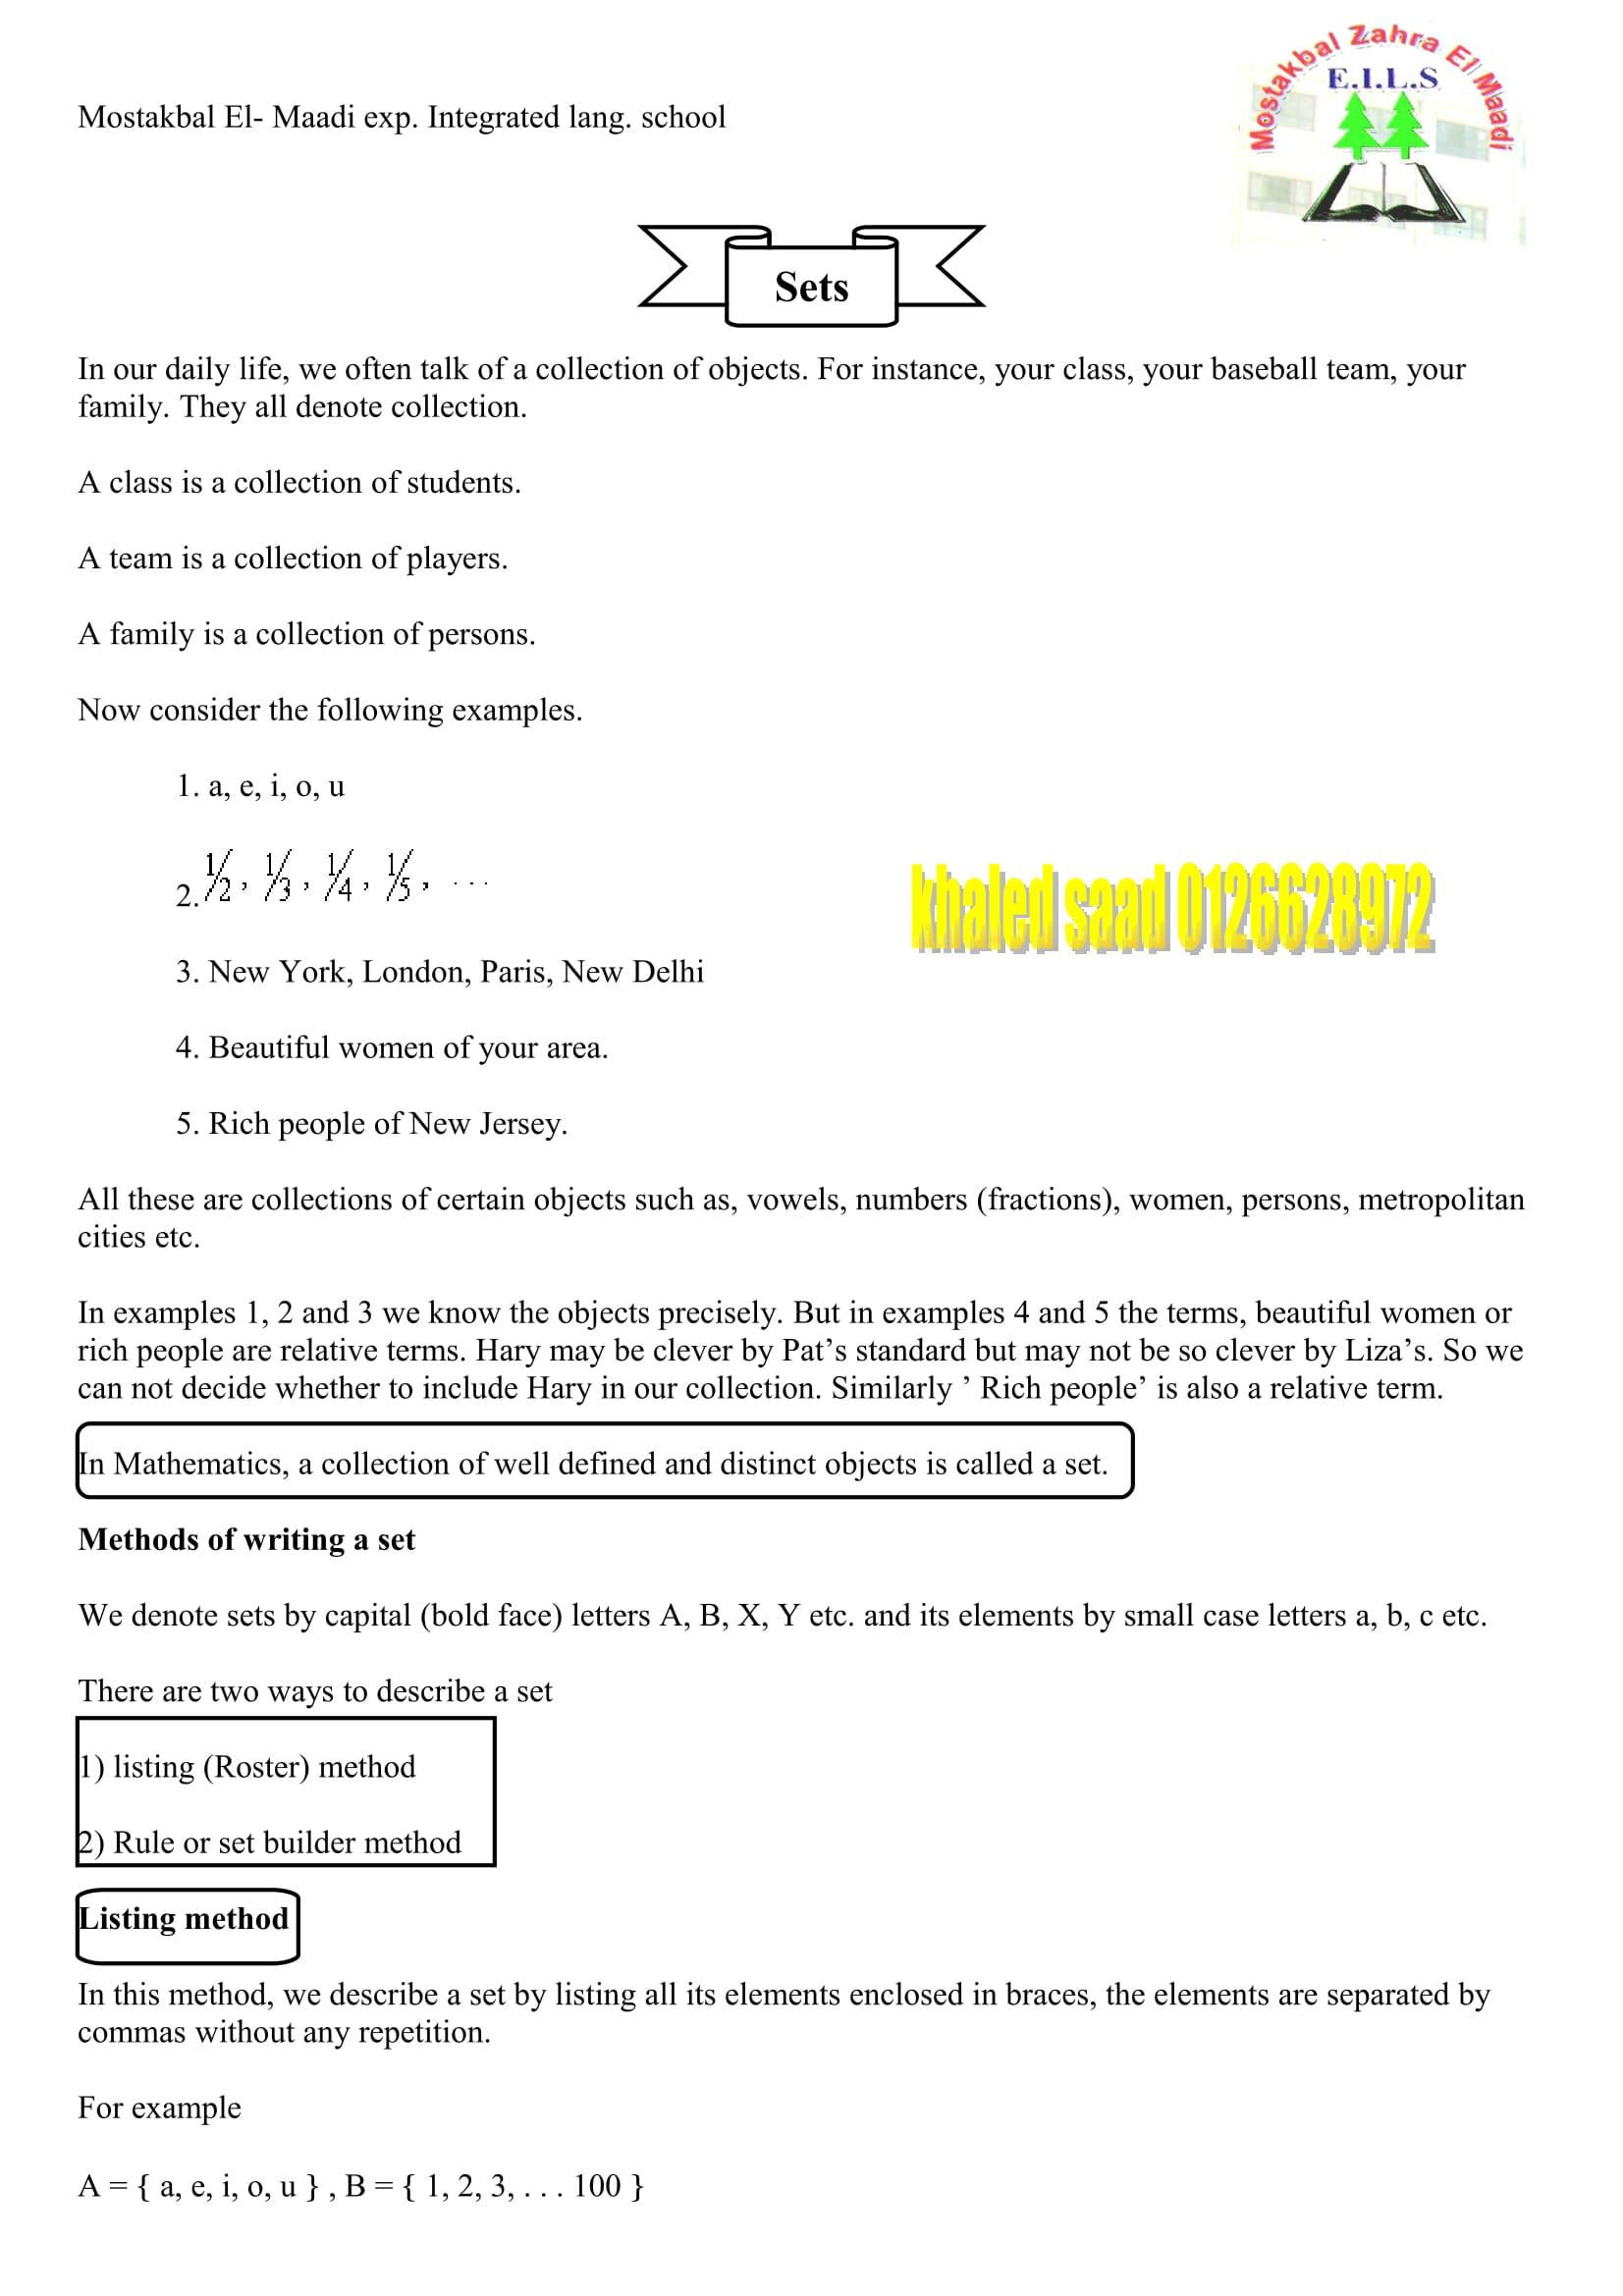 exam-eg.com_1510410053291.jpg